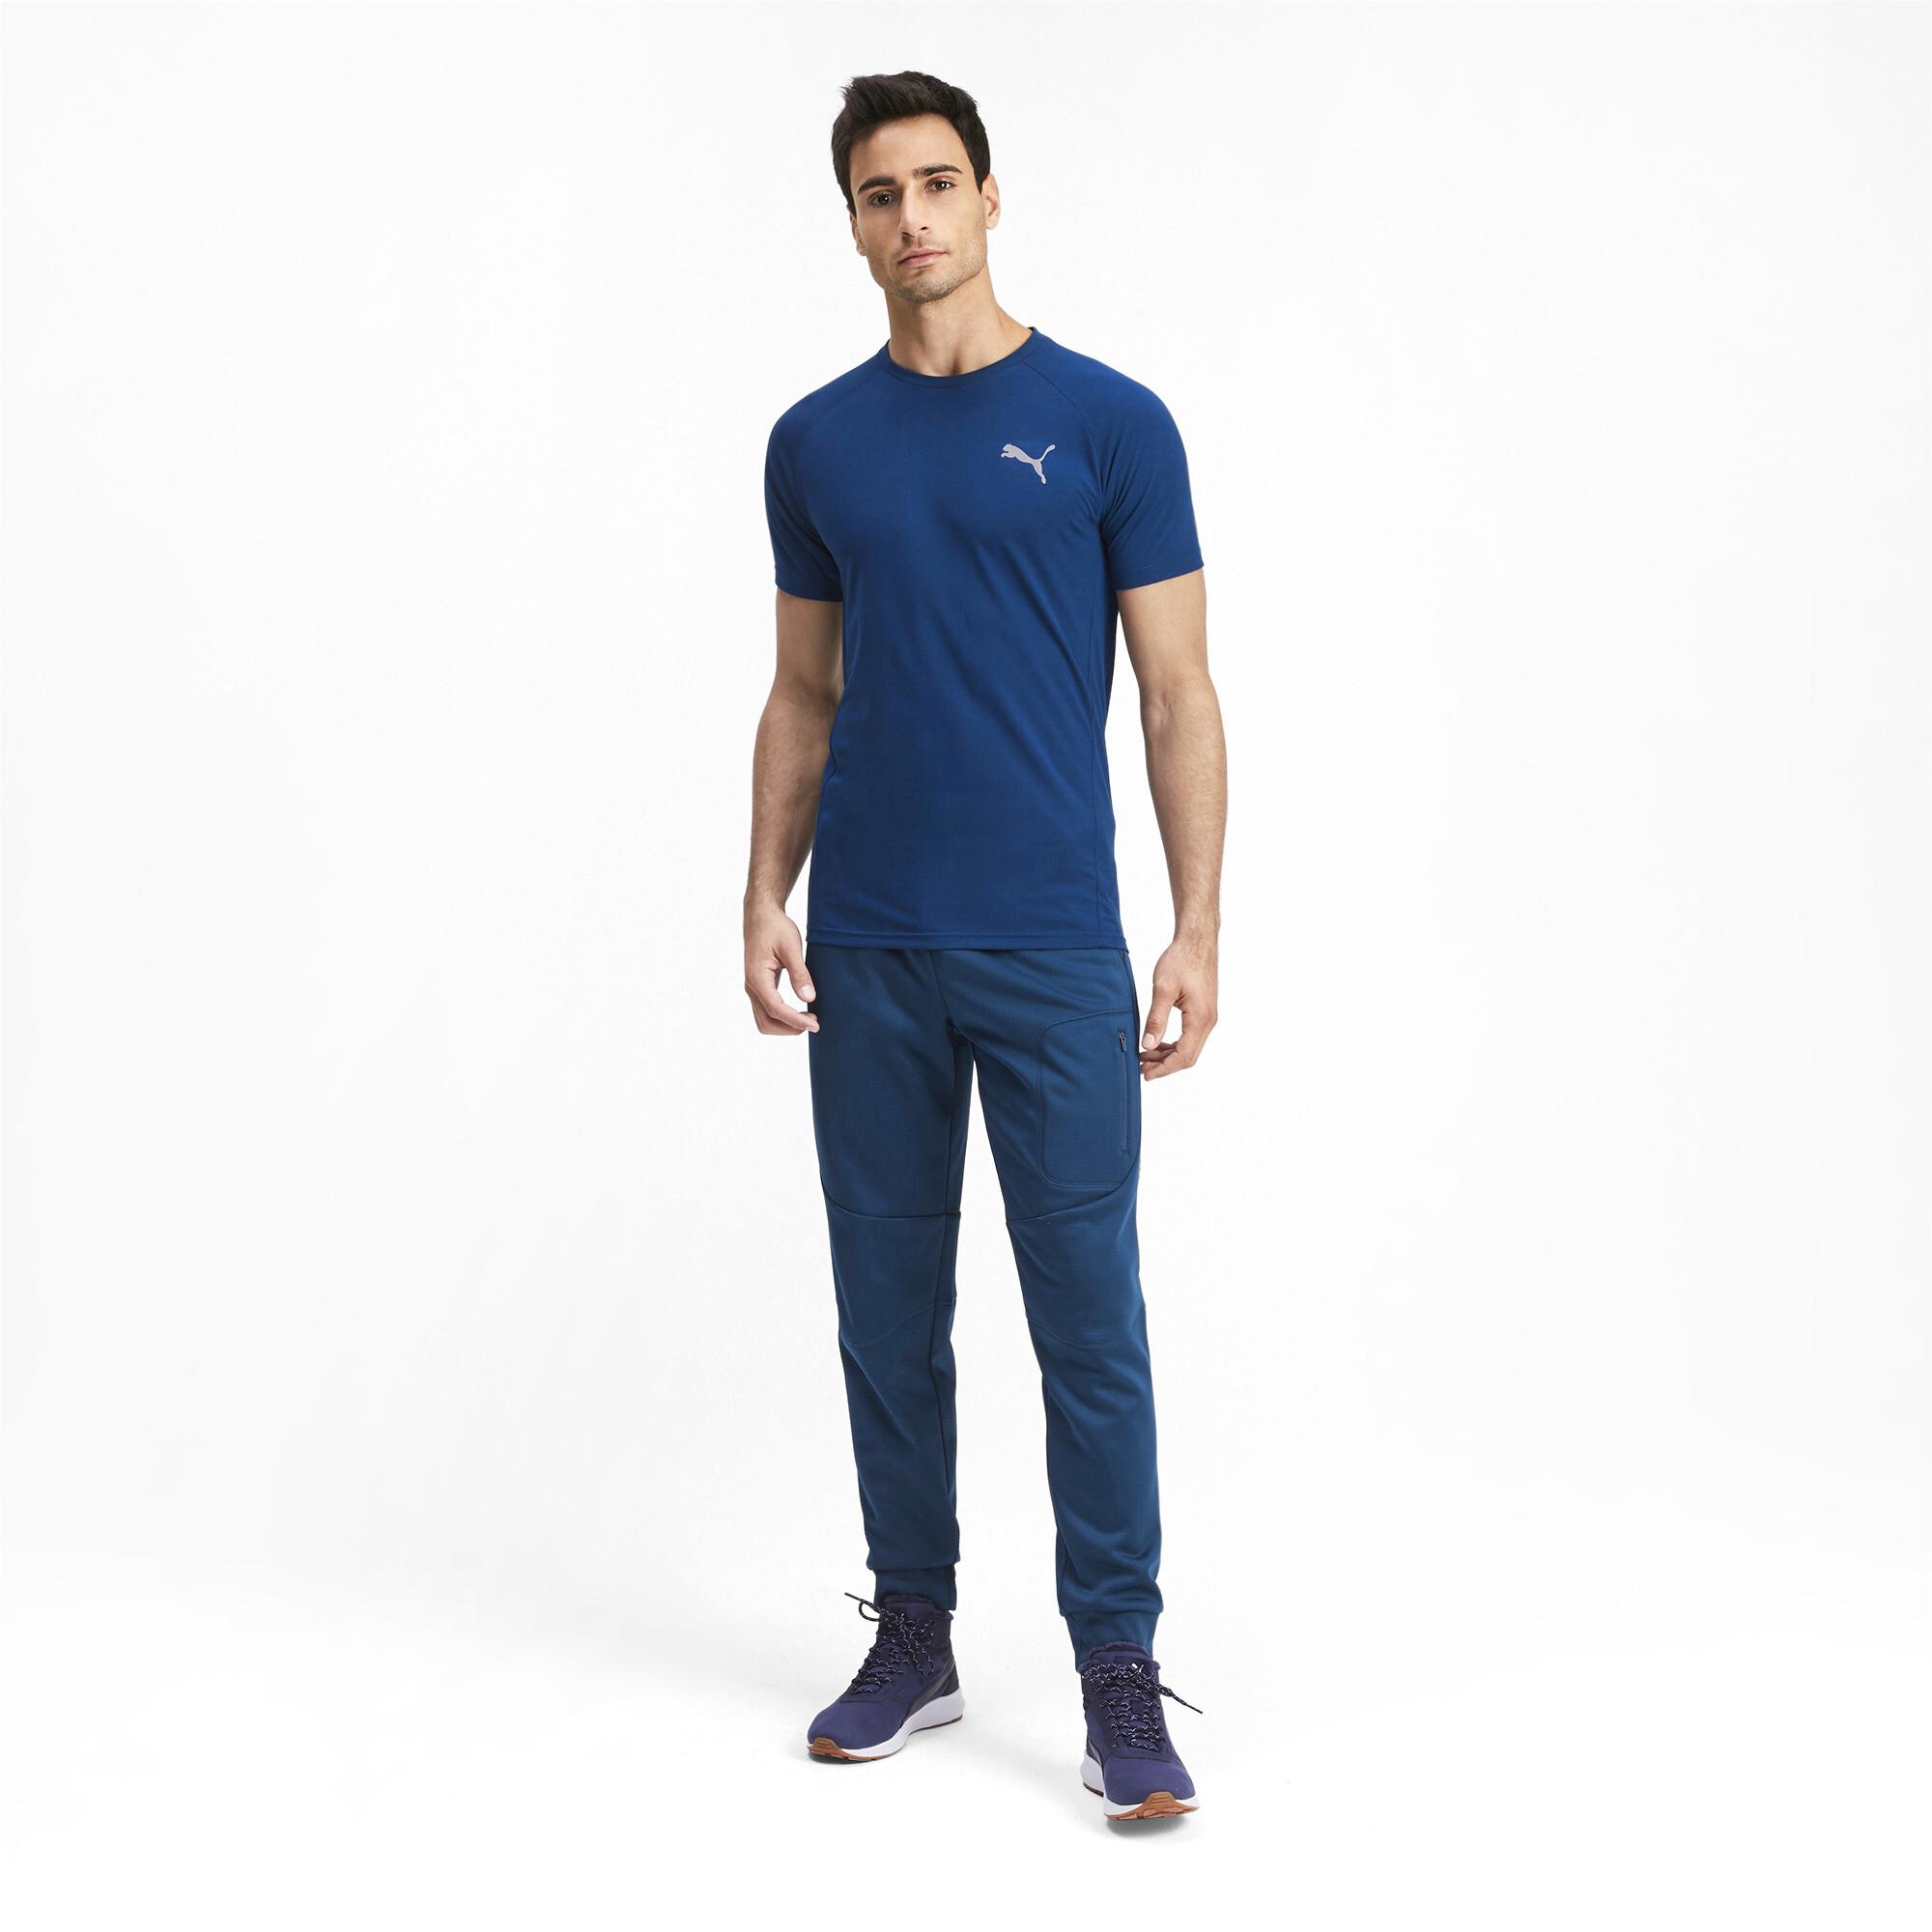 PUMA-Evostripe-Warm-Men-039-s-Pants-Men-Knitted-Pants-Basics miniatura 16